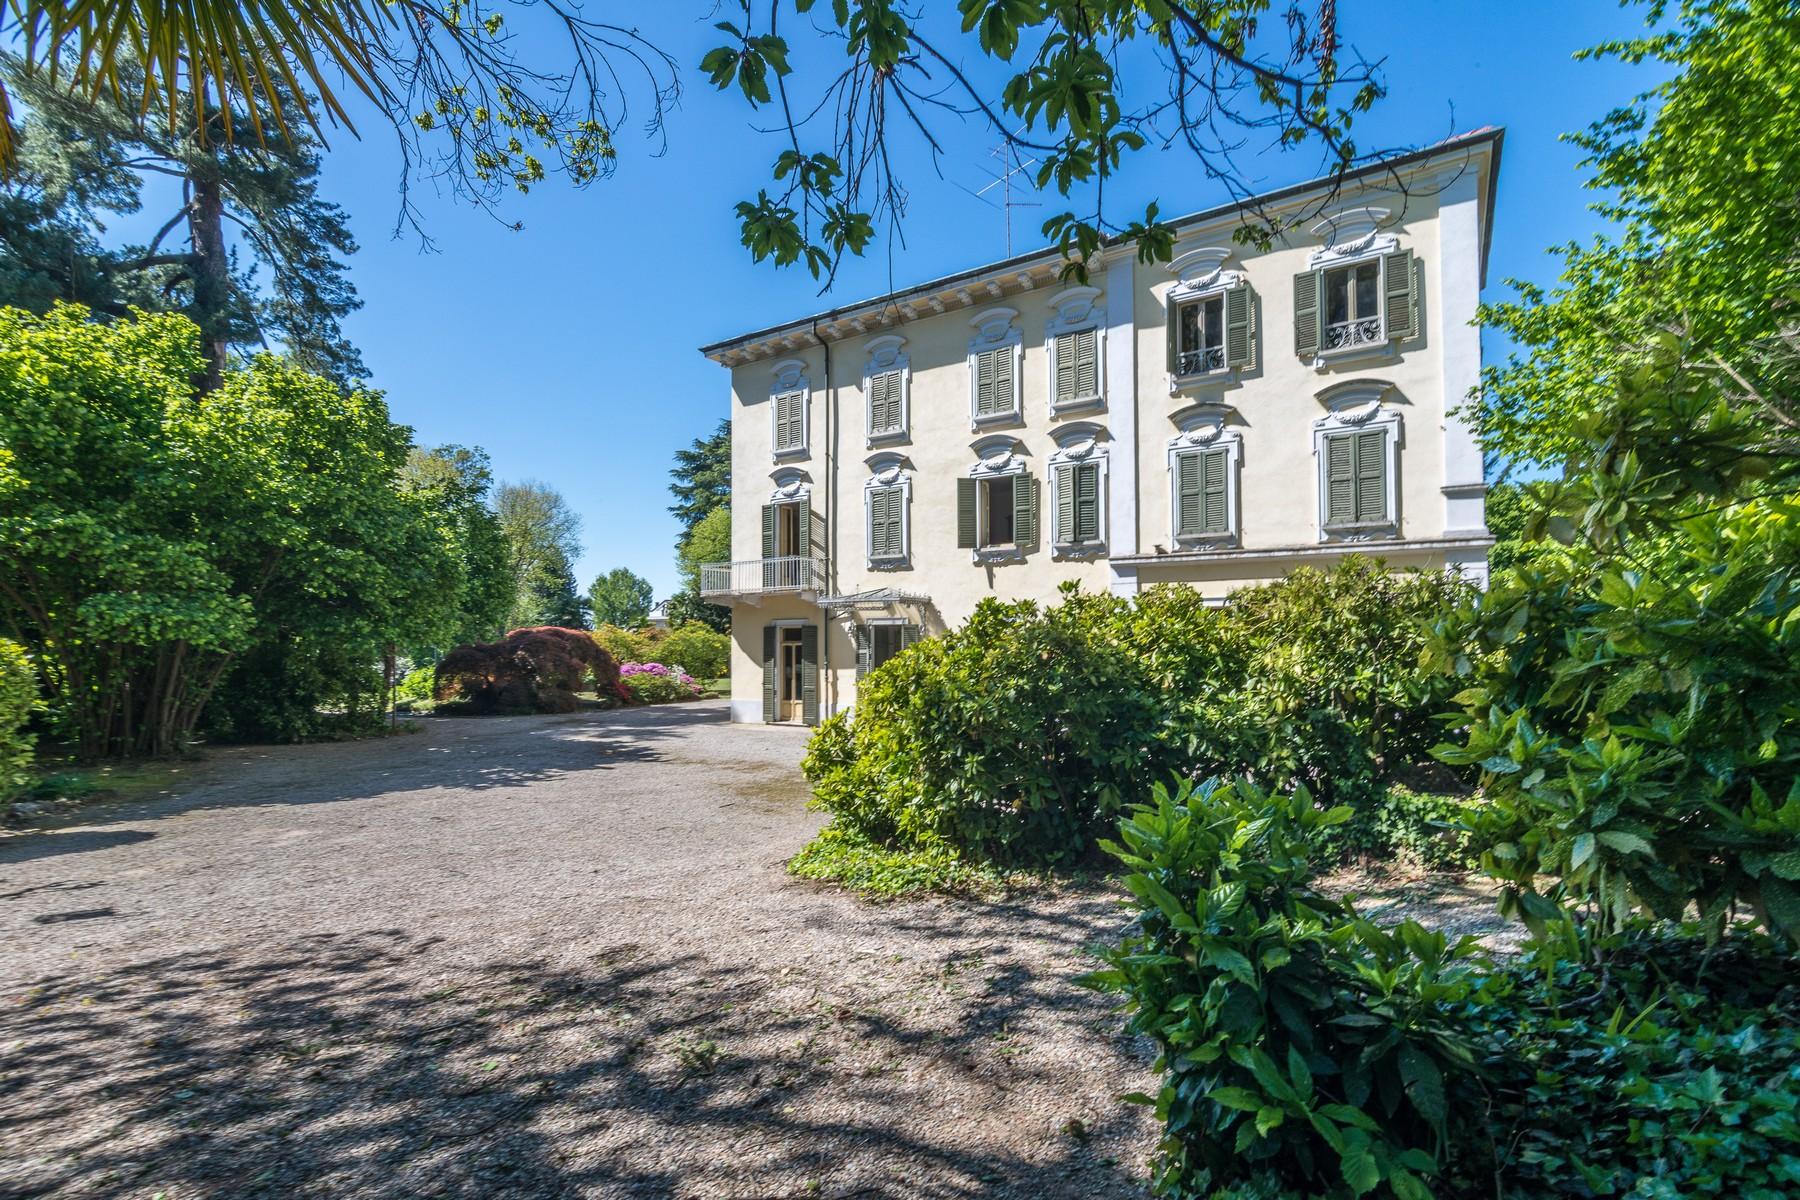 Villa in Vendita a Varese: 5 locali, 1500 mq - Foto 5